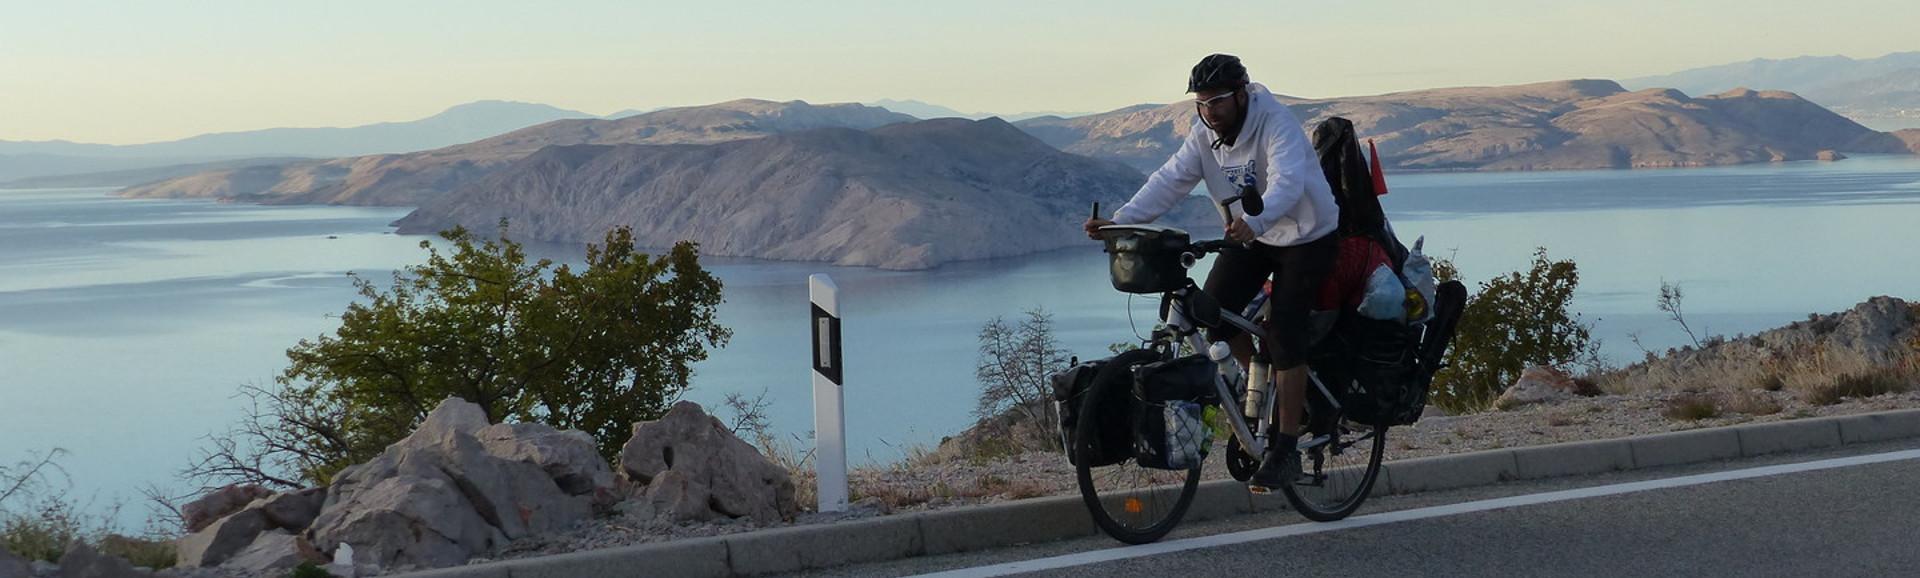 Viajando en bicicleta por Croacia